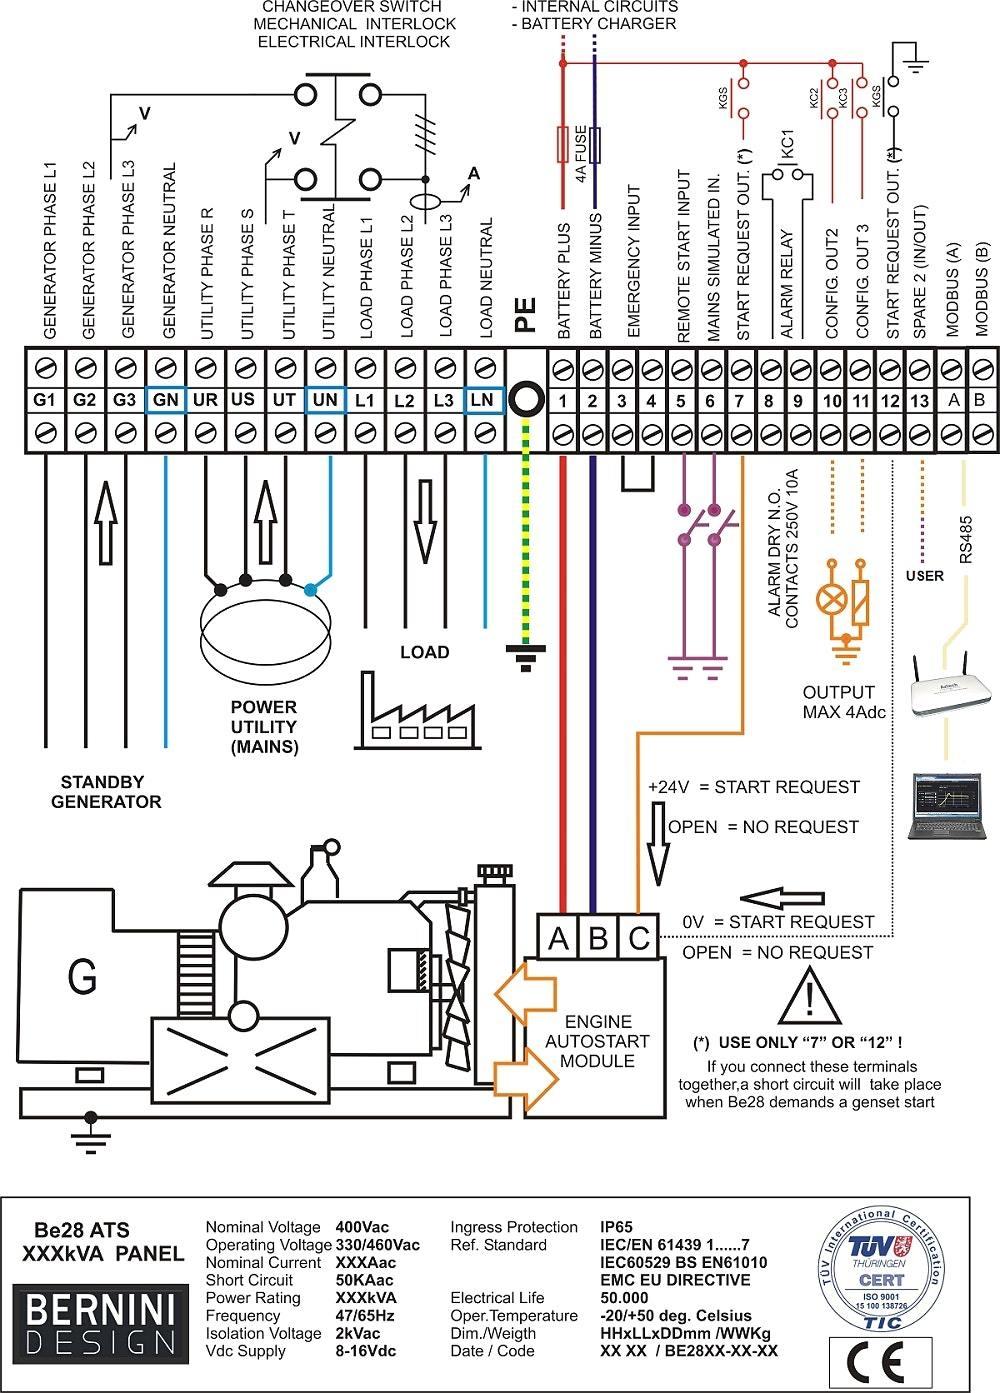 Westinghouse Ats Wiring Diagram Wiring Diagram Post